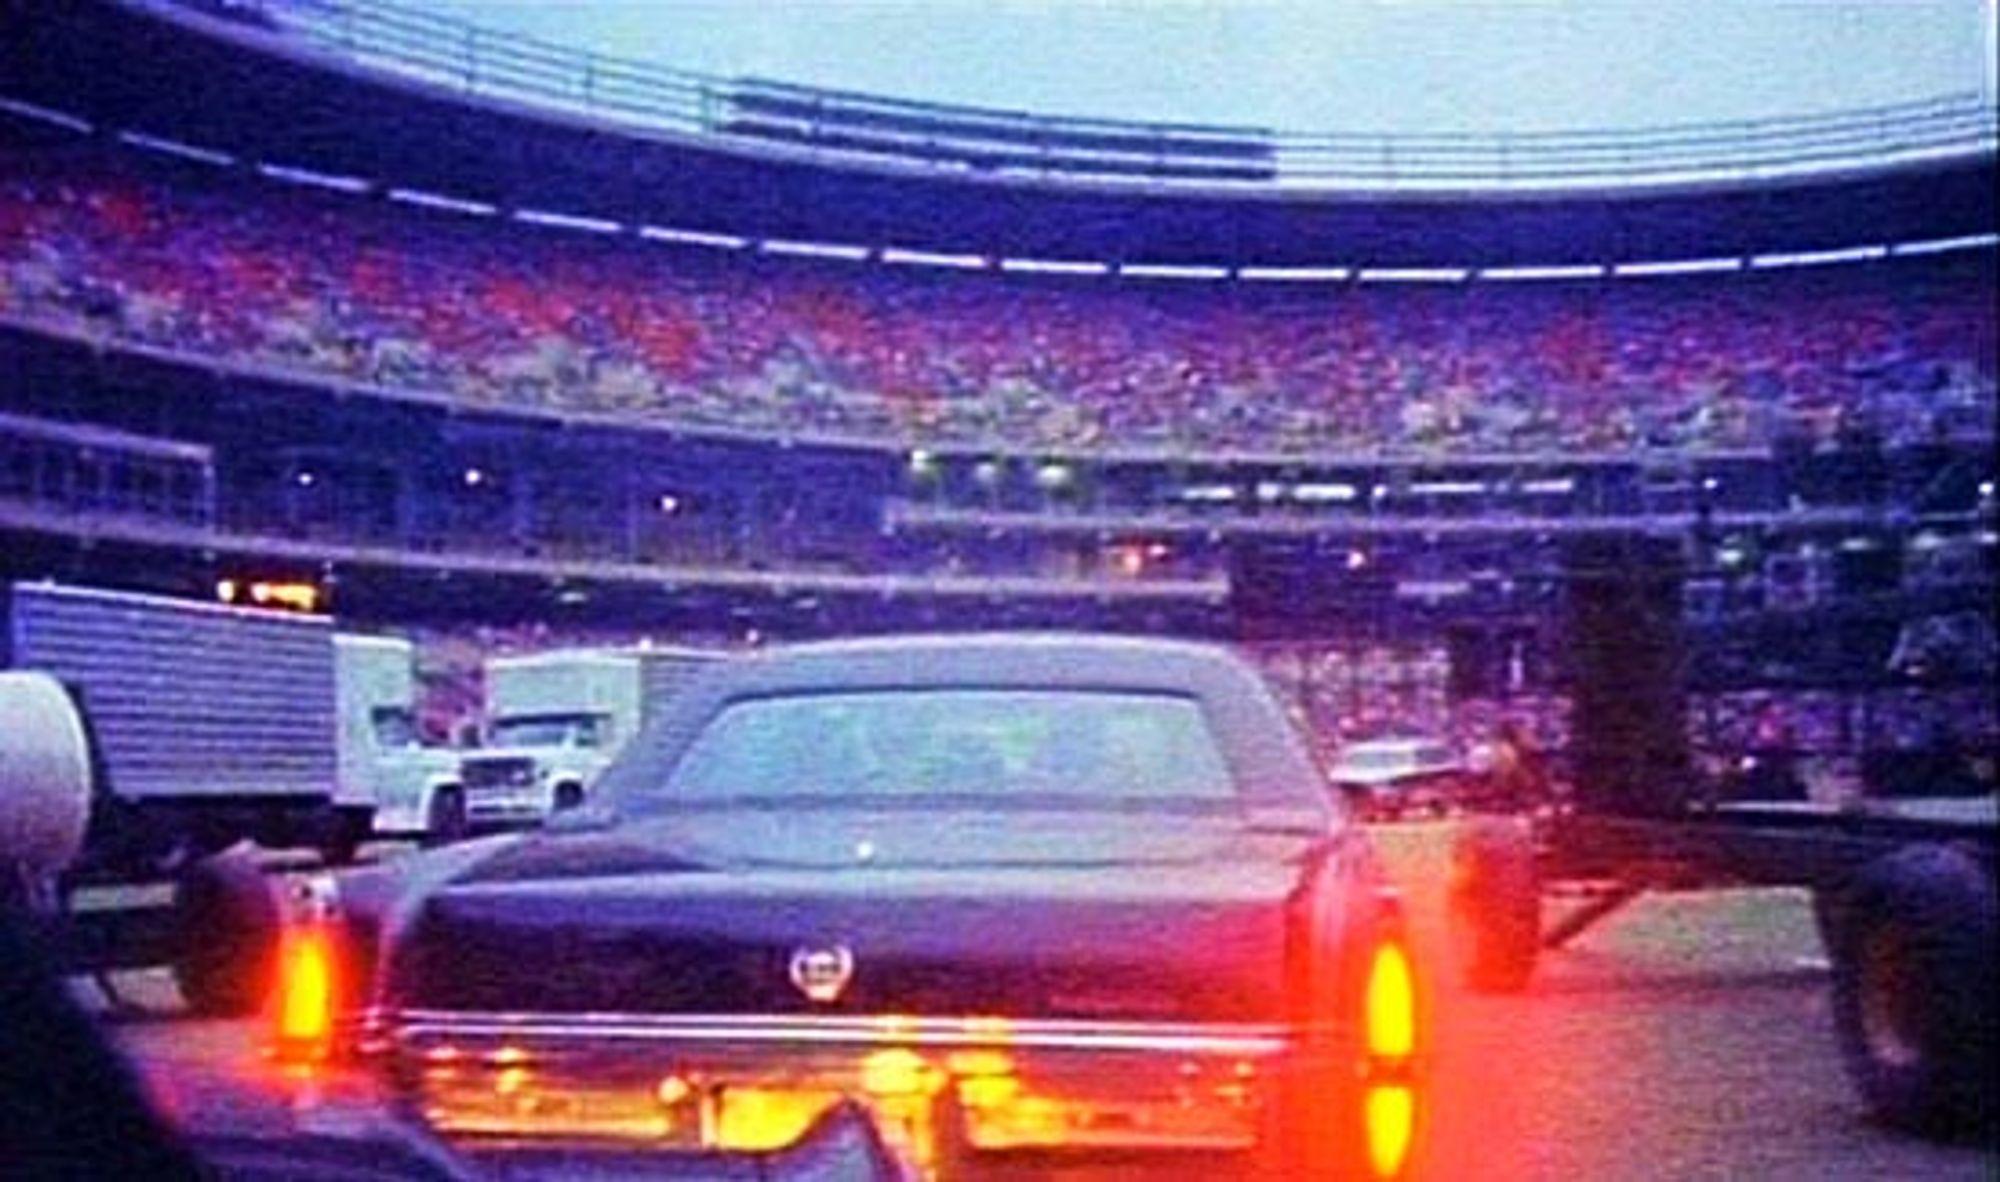 Verdens da største rockeband ankommer stadion standsmessig.